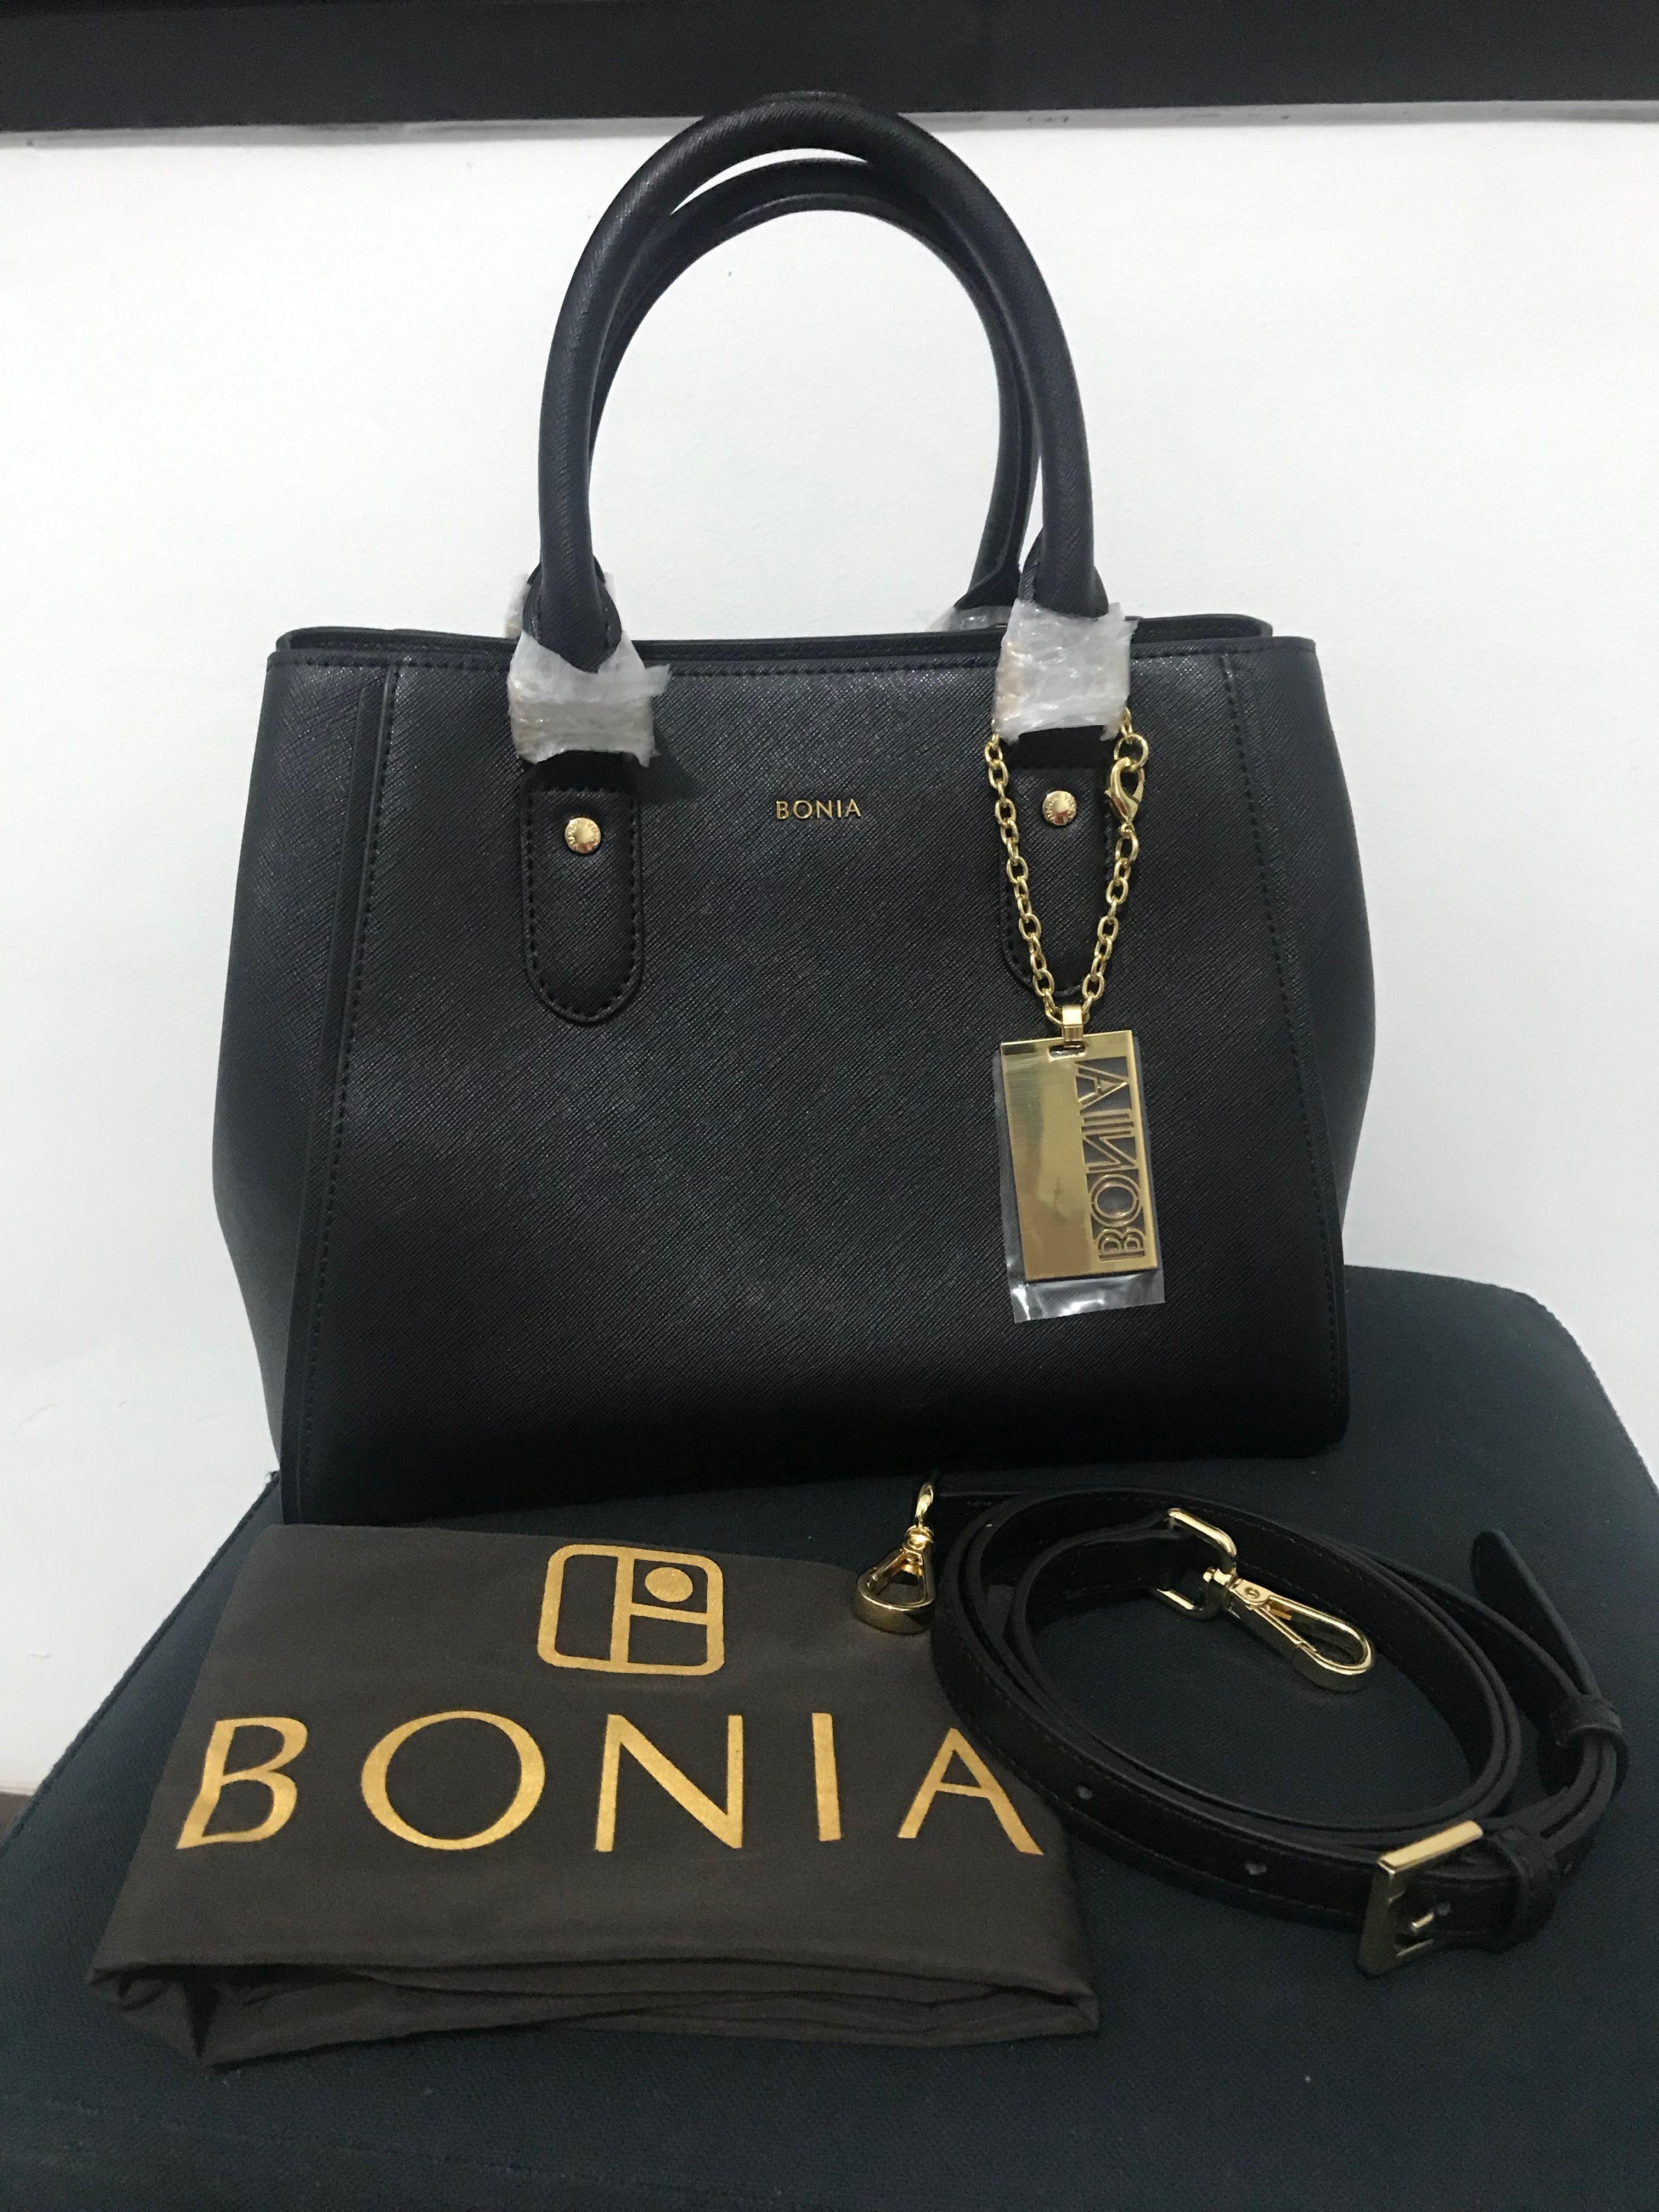 3b352d81d5dd Jual Tas Bonia #JualTasBonia #boniabag #shoulderbag #slingbag #blackbag  #littleblackbag #sling #bag